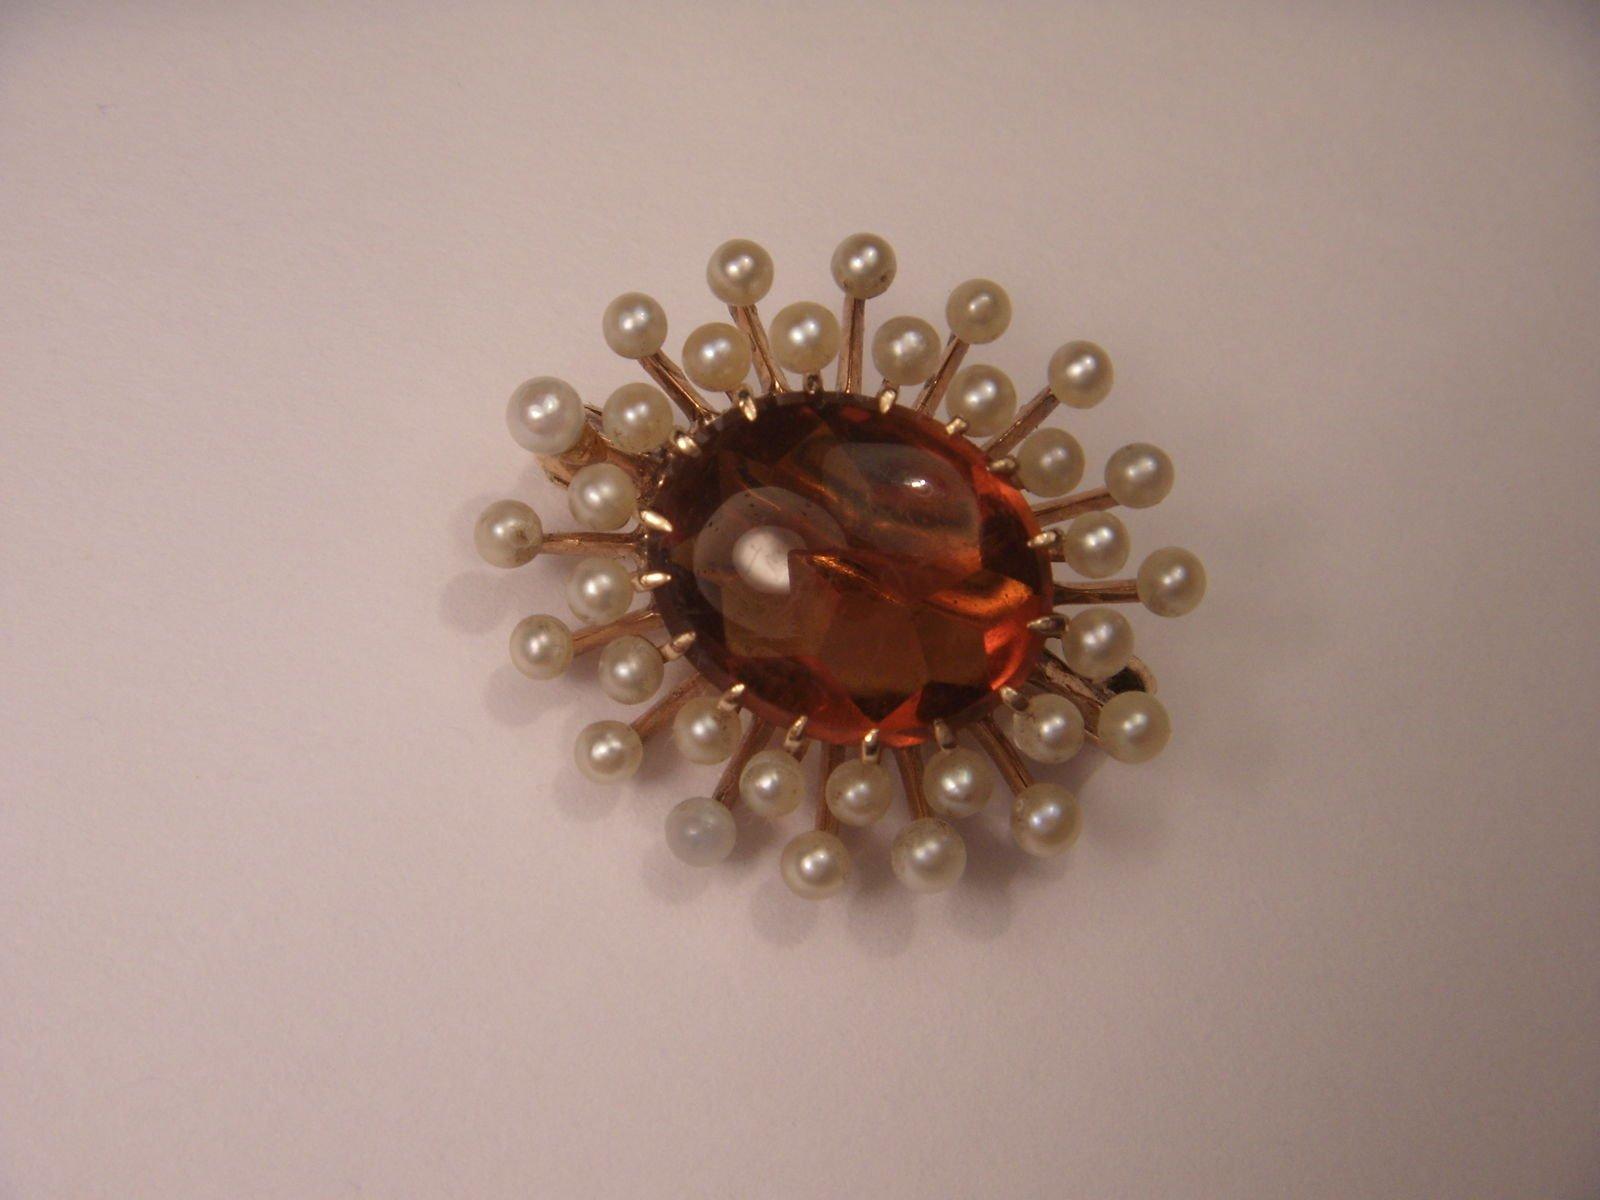 Antique 14K Rose Gold Cabochon Orange Citrine Seed Pearl Handmade Brooch Pin